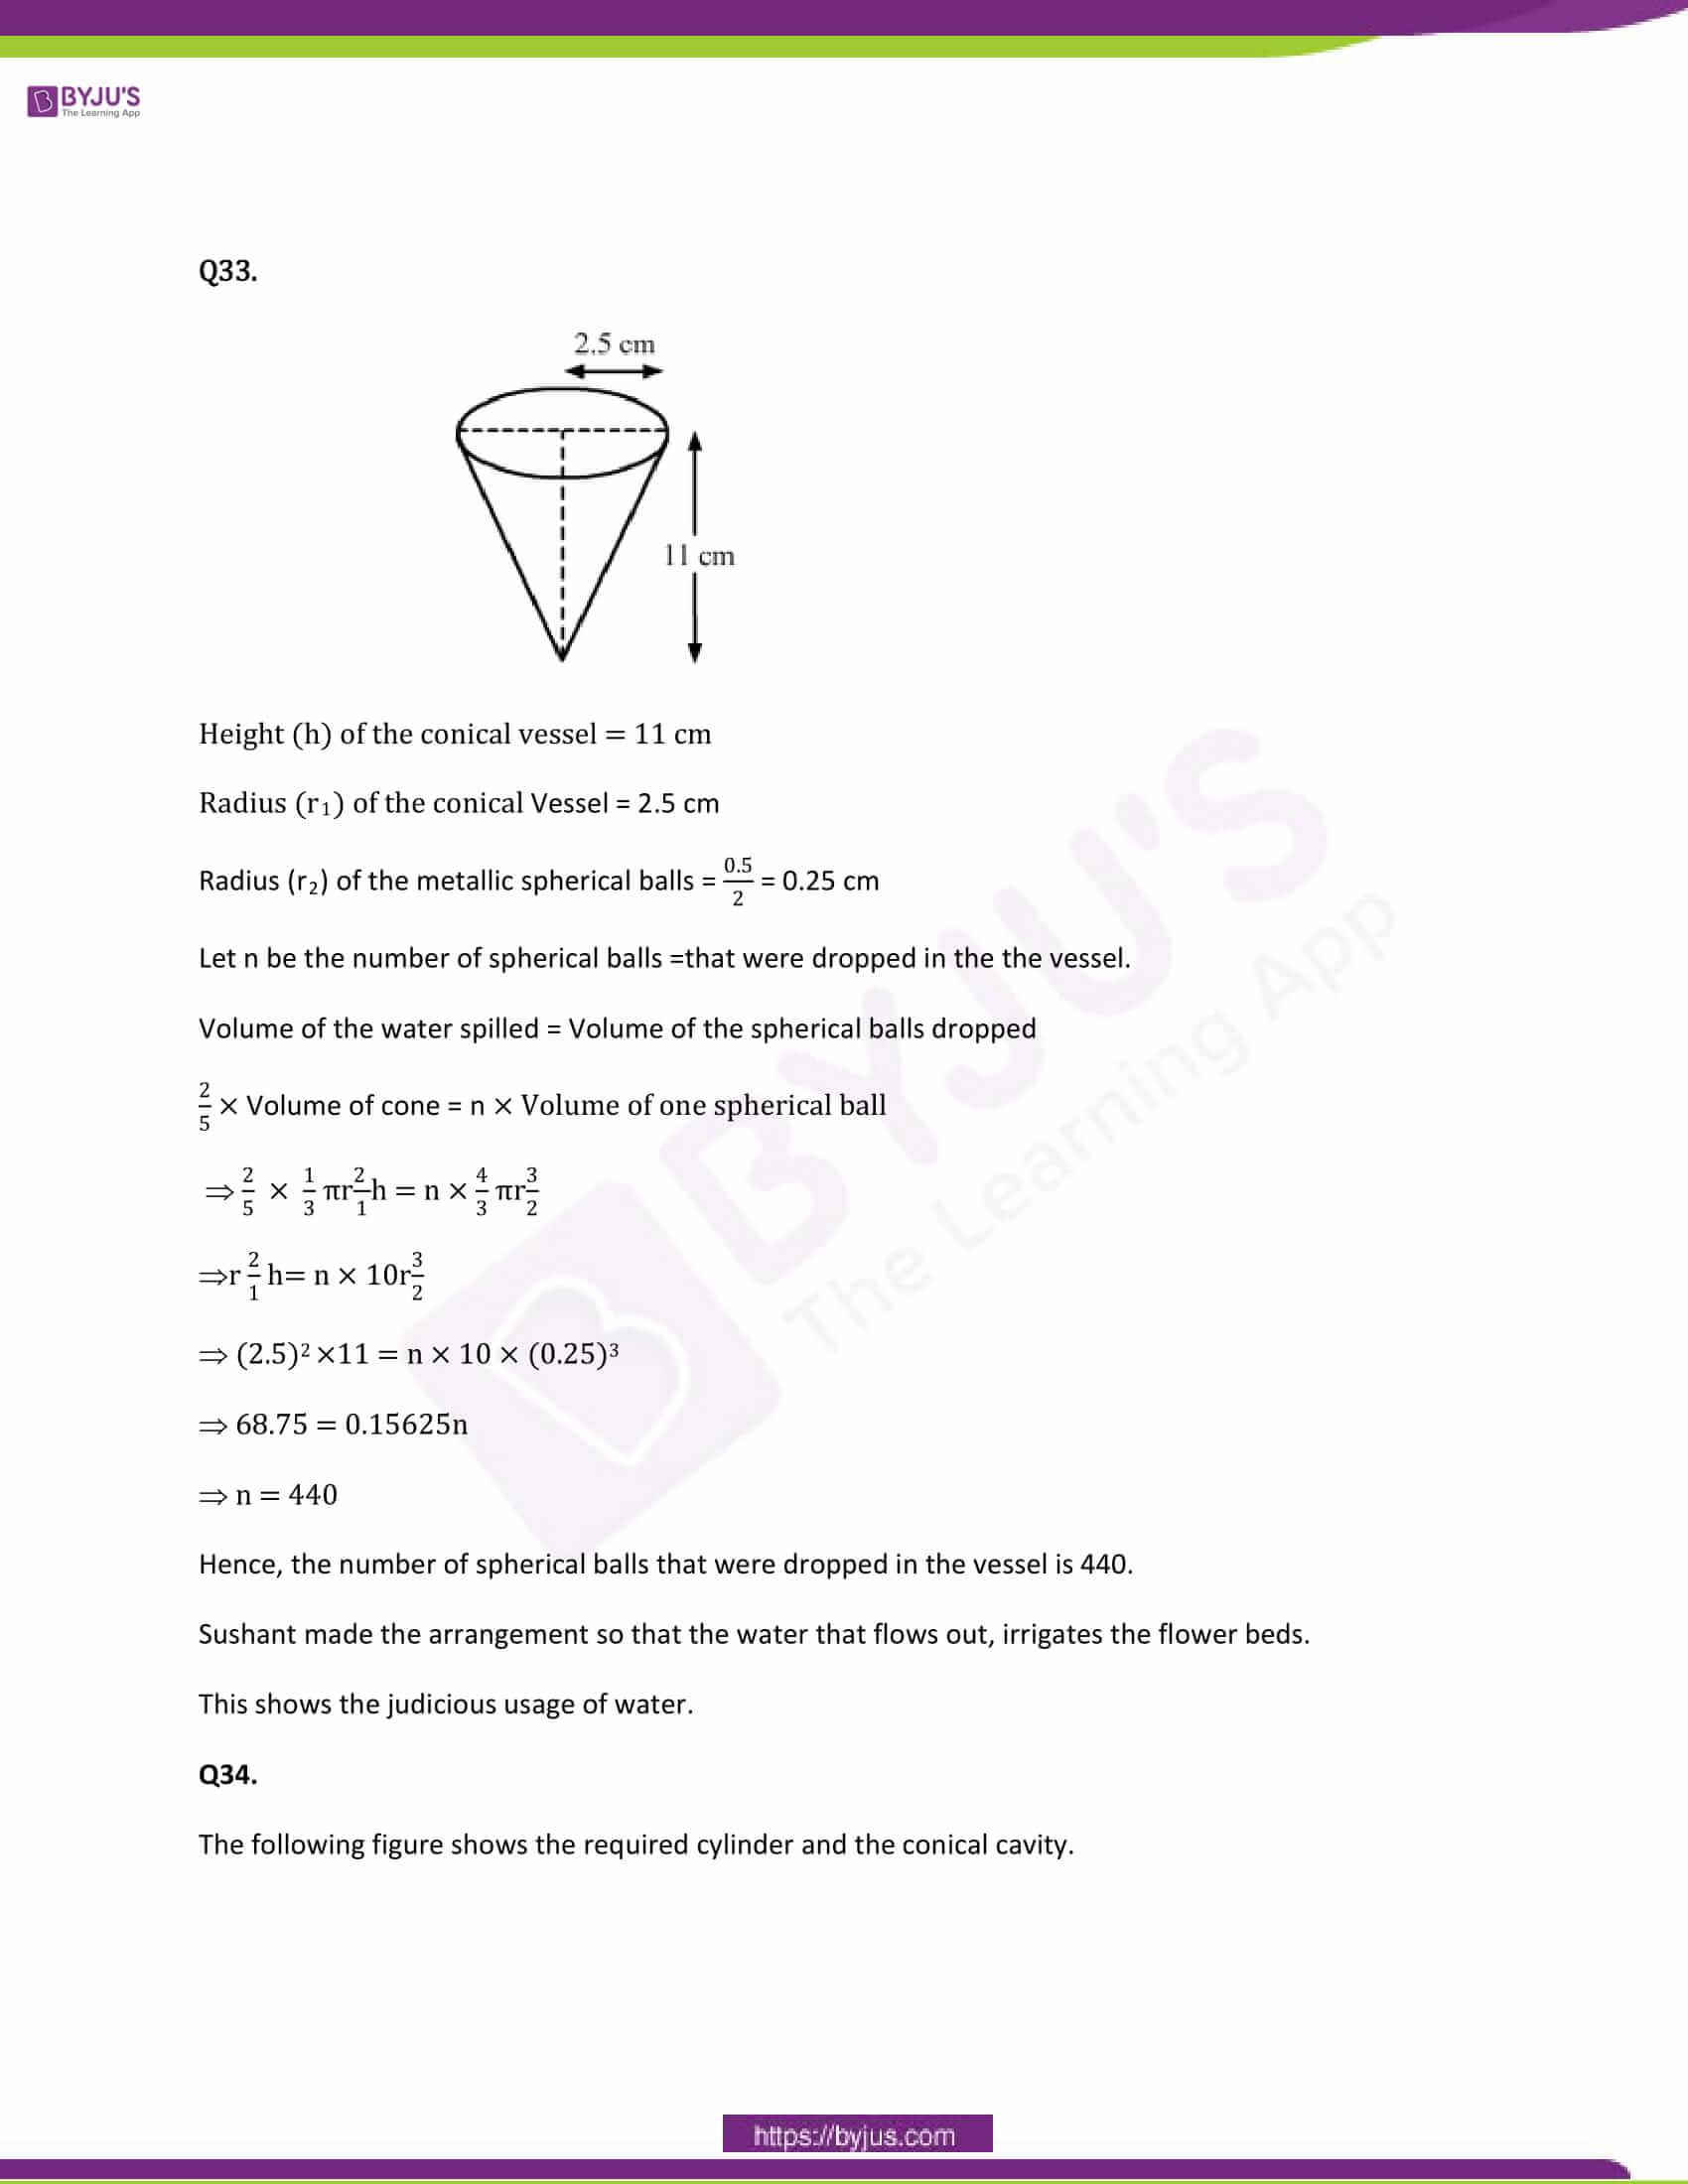 CBSE Class 10 Maths Papers Solution 2014 24